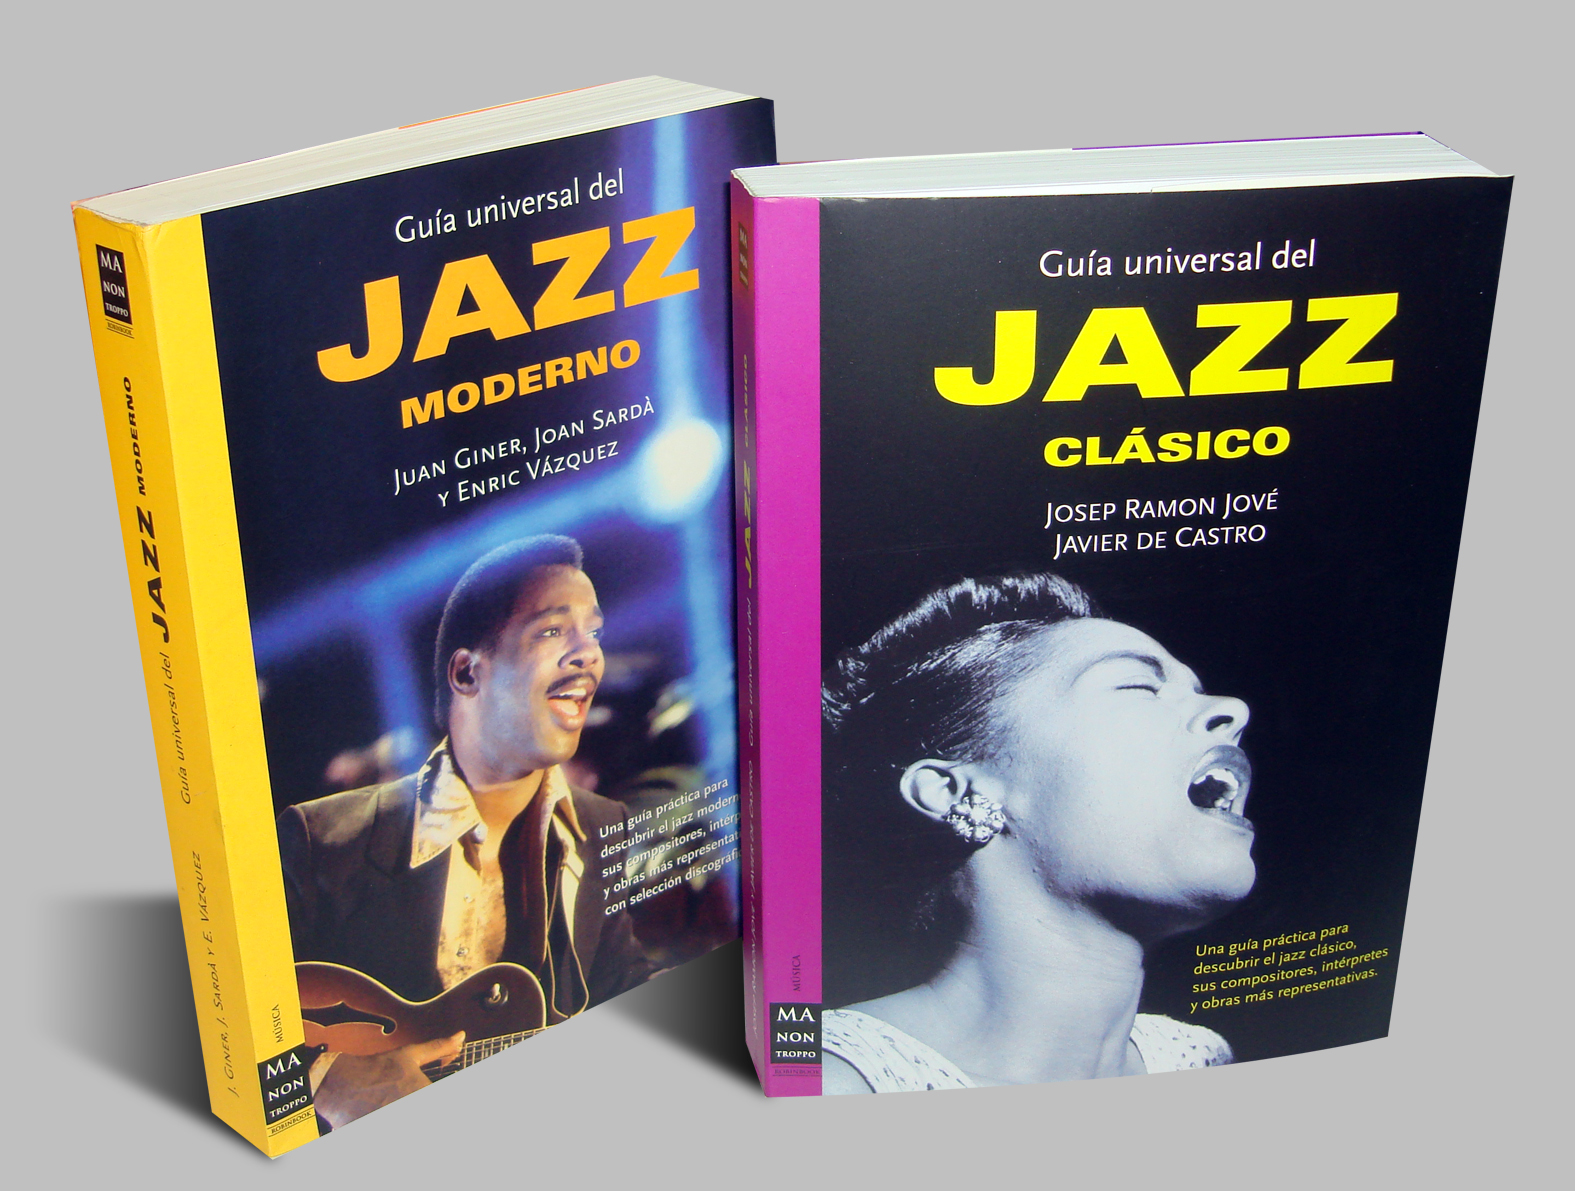 https://argentjazz.com.ar/wp-content/uploads/2012/08/Jazz-Clasico-y-moderno.jpg